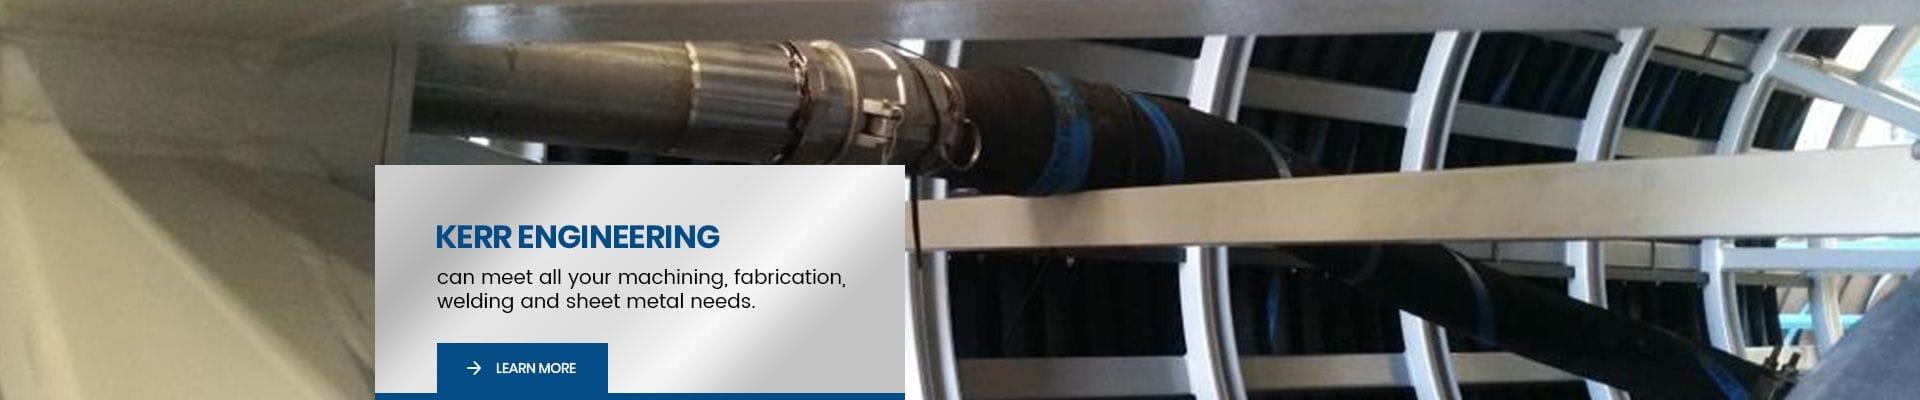 Kerr Engineering | Machining Services Western Australia